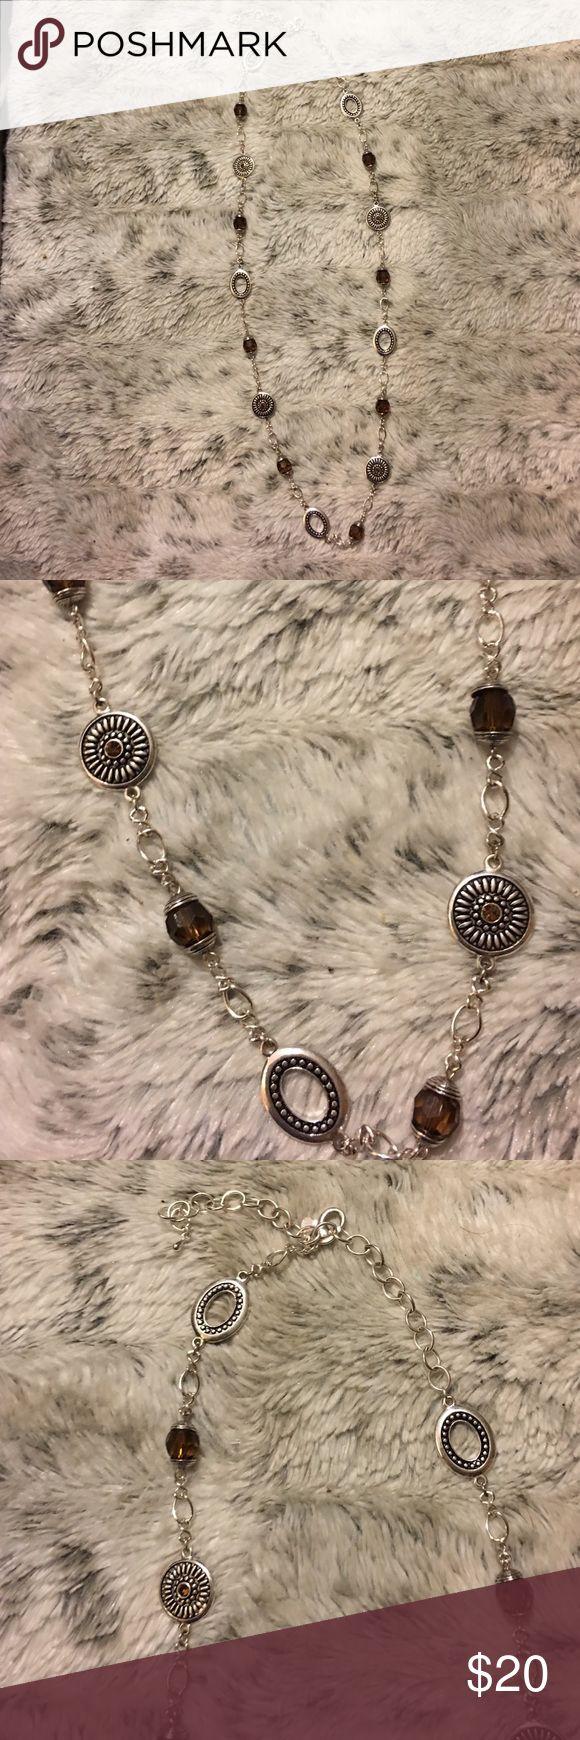 NWOT Premier Jewelry Long Silver & Brown Necklace NWOT Premier Jewelry Silver & Brown Long Necklace Premier Designs Jewelry Necklaces